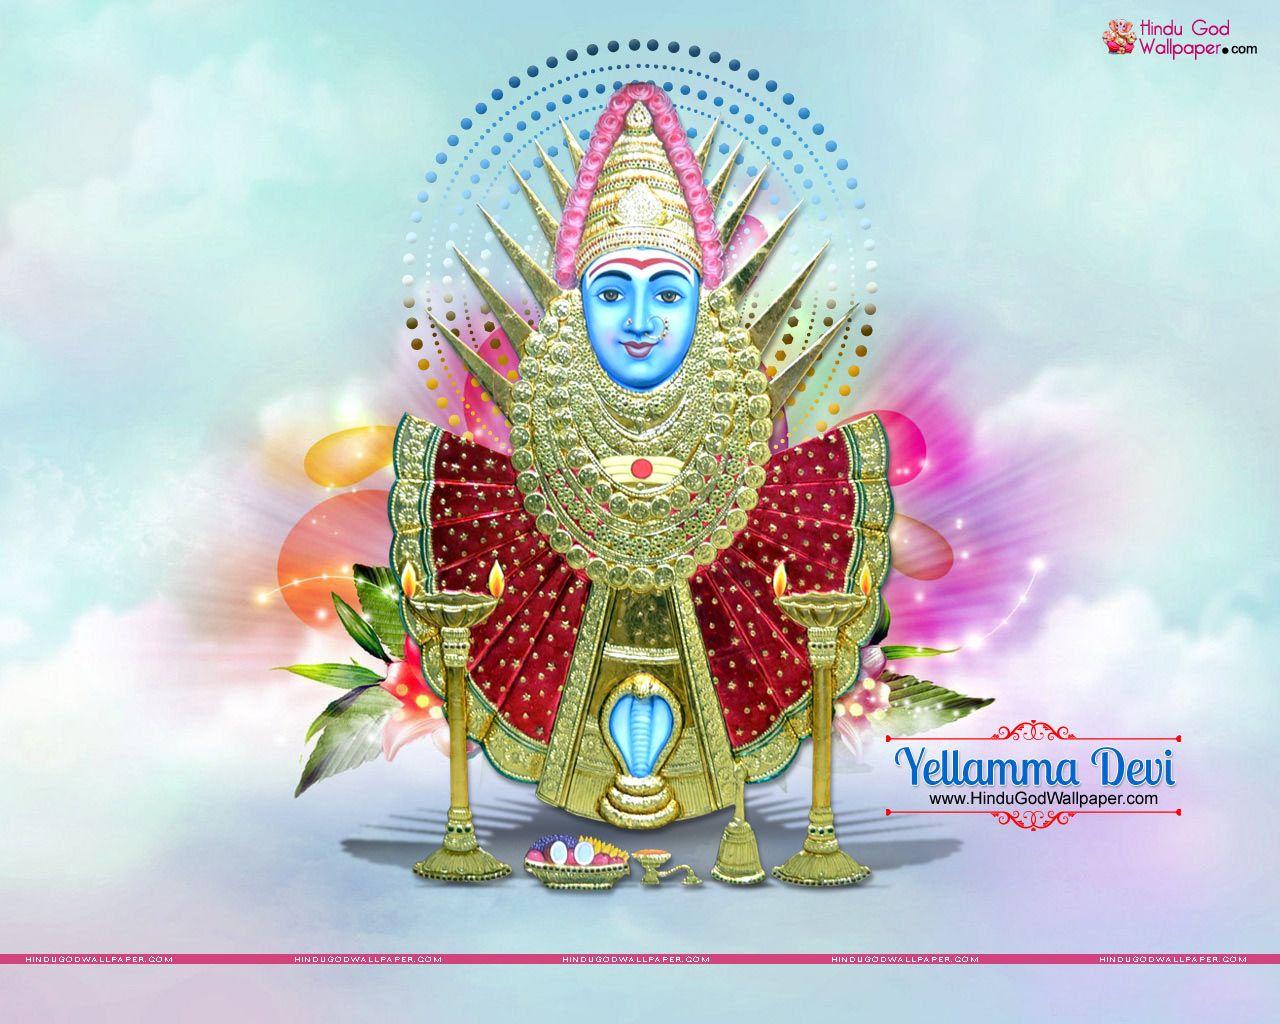 Goddess Renuka Devi Yellamma Wallpaper Free Download Renuka Devi